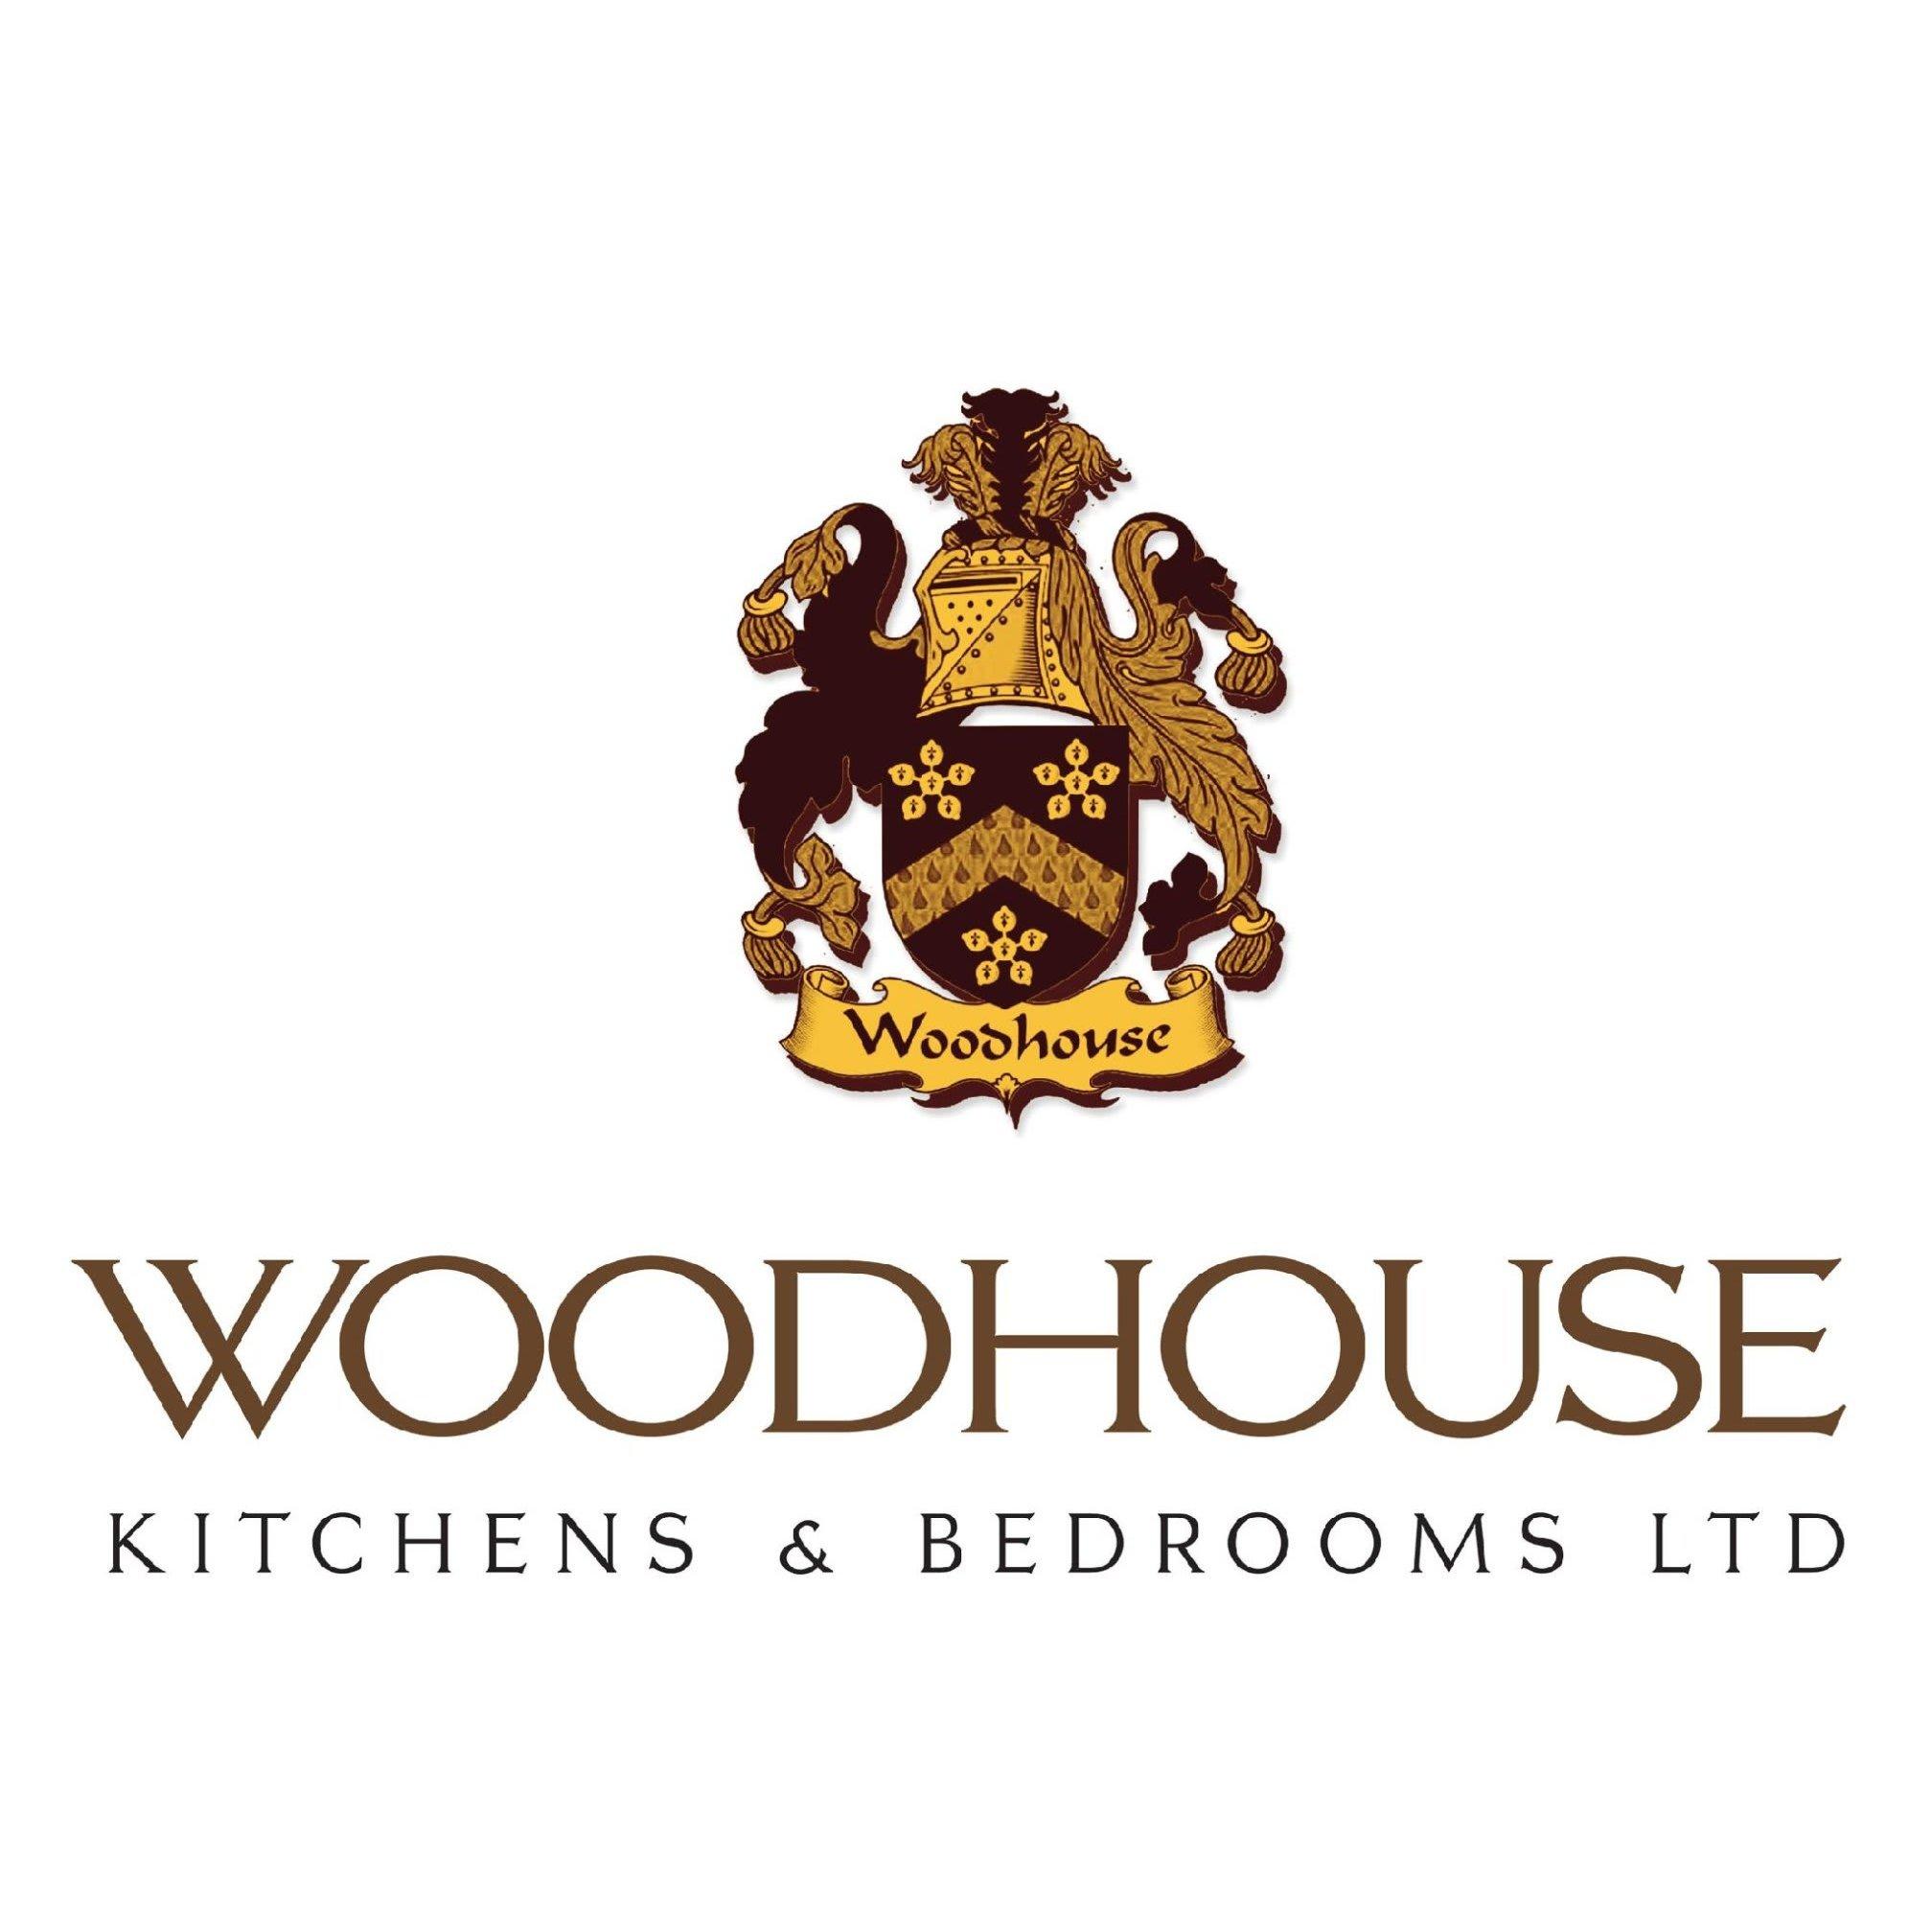 Woodhouse Kitchens & Bedrooms Ltd